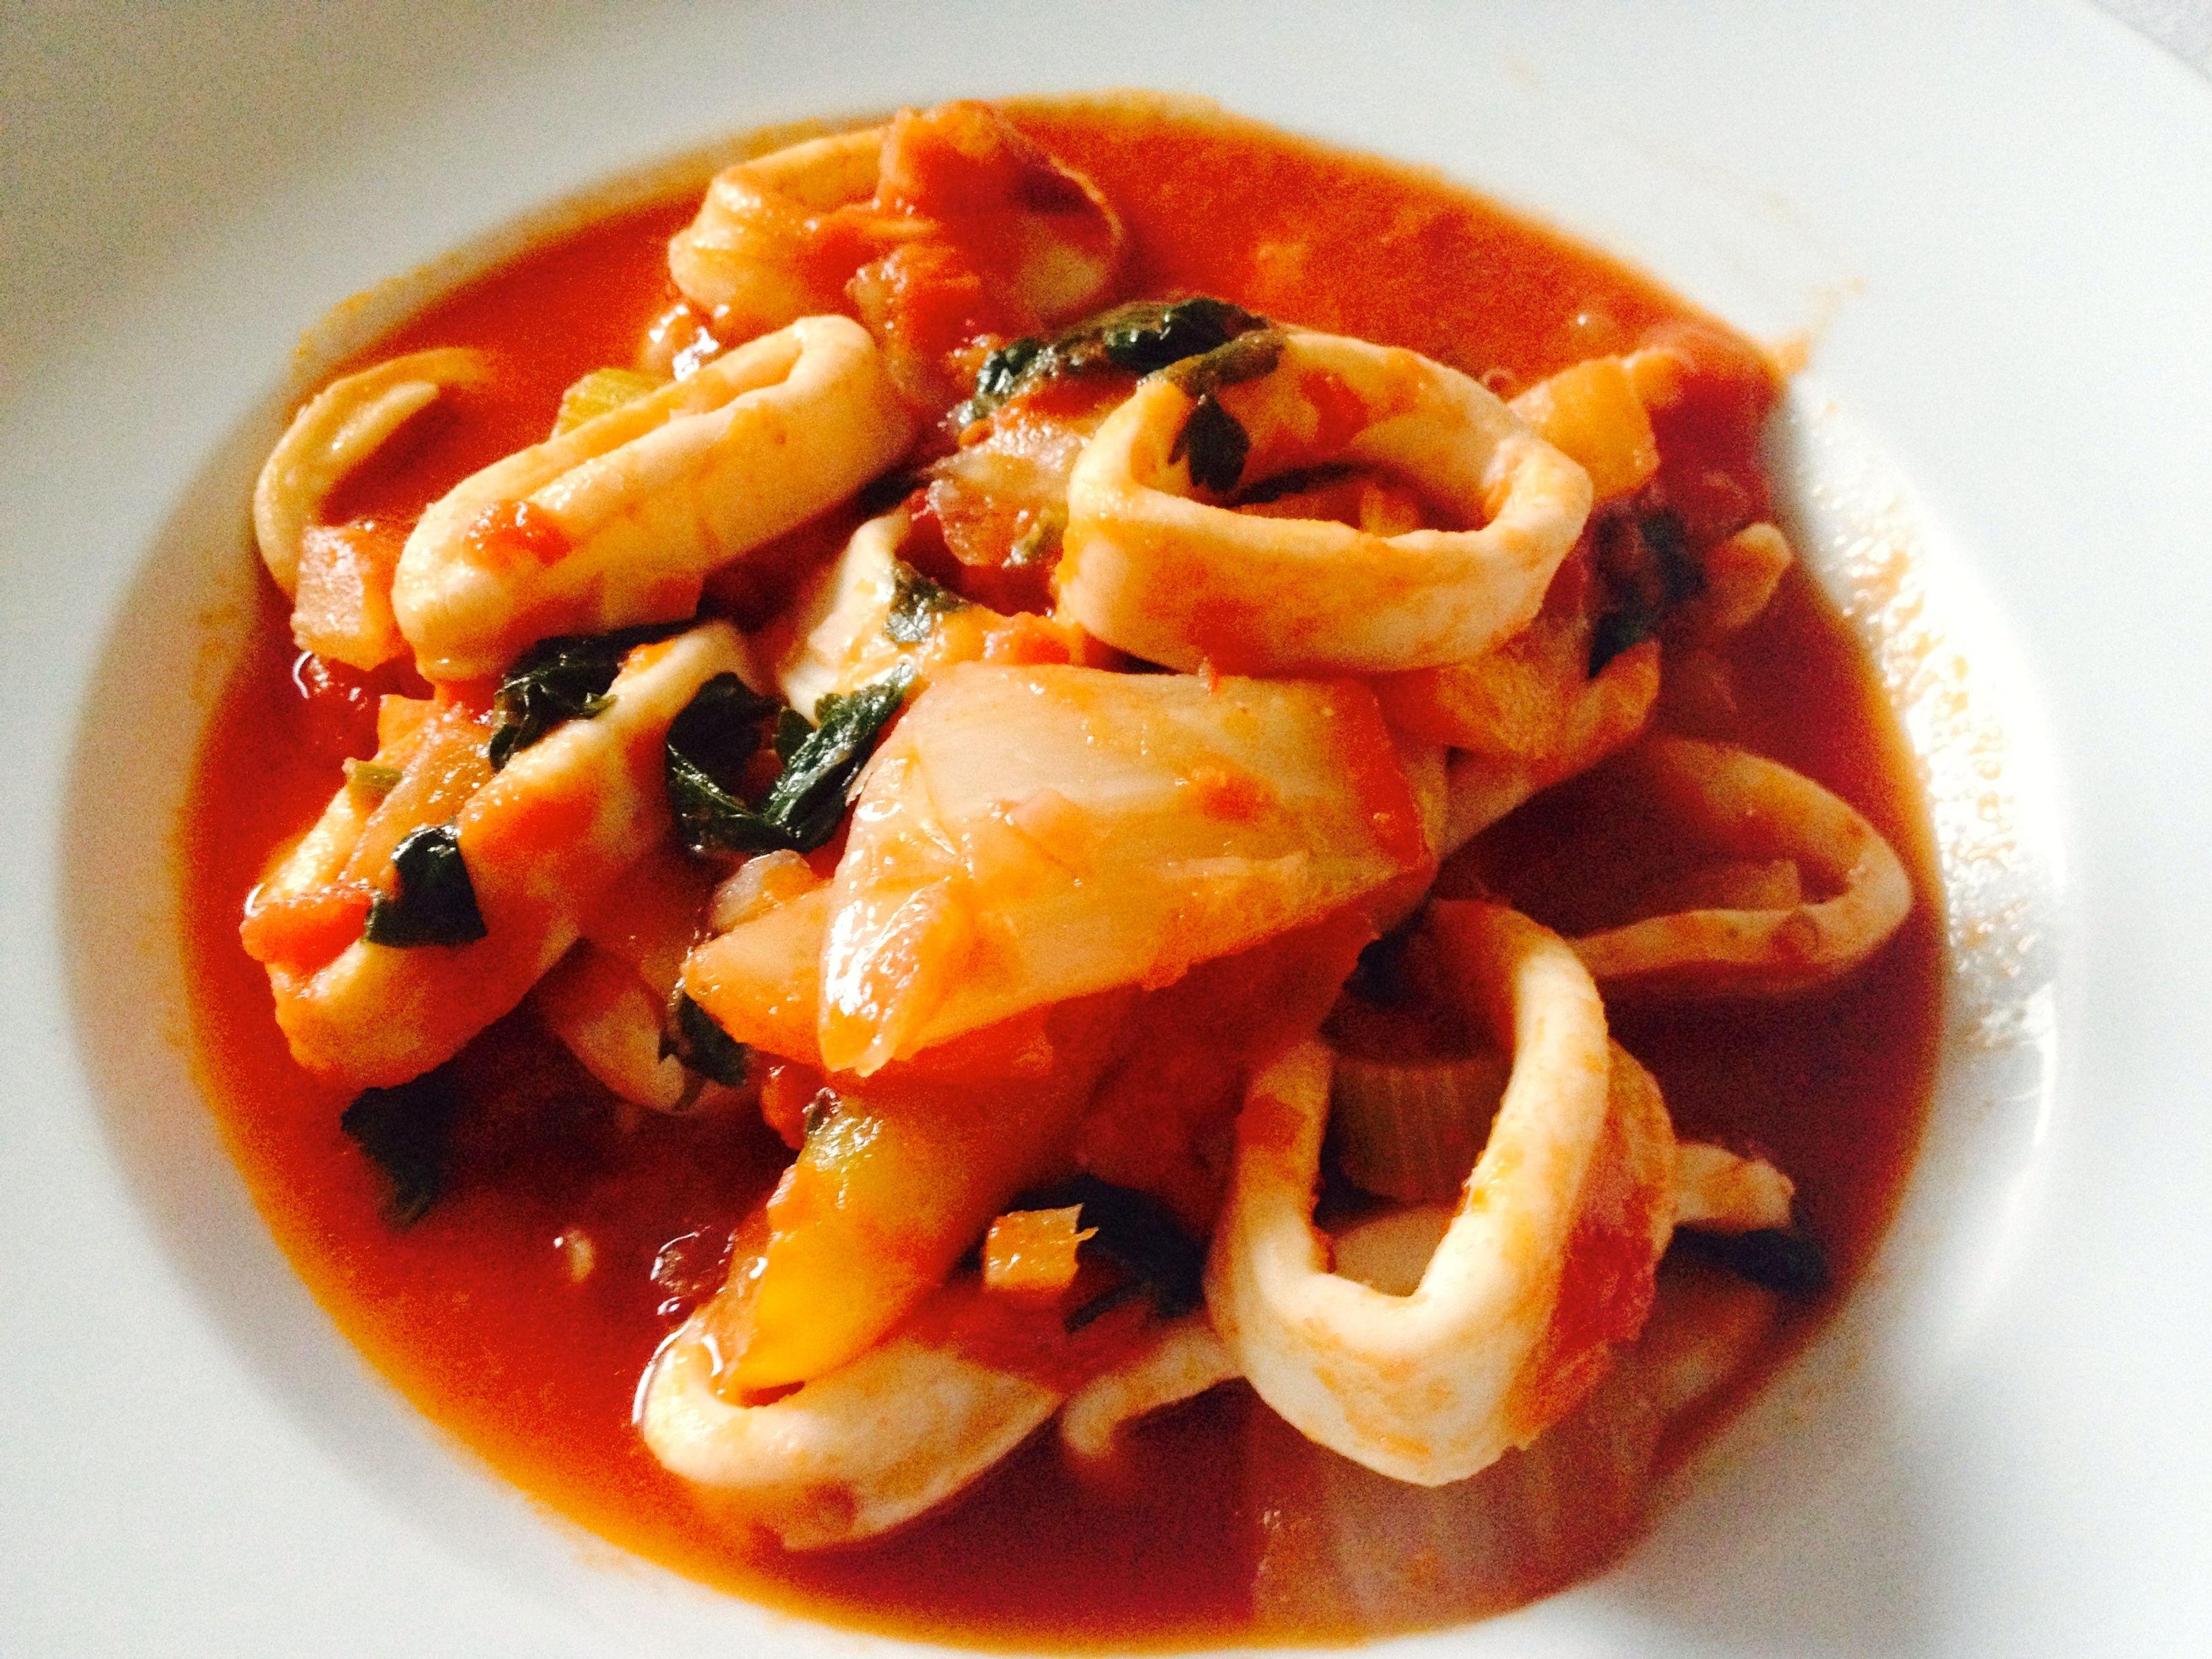 Tintenfischringe mit Fenchel in Tomatensoße 1